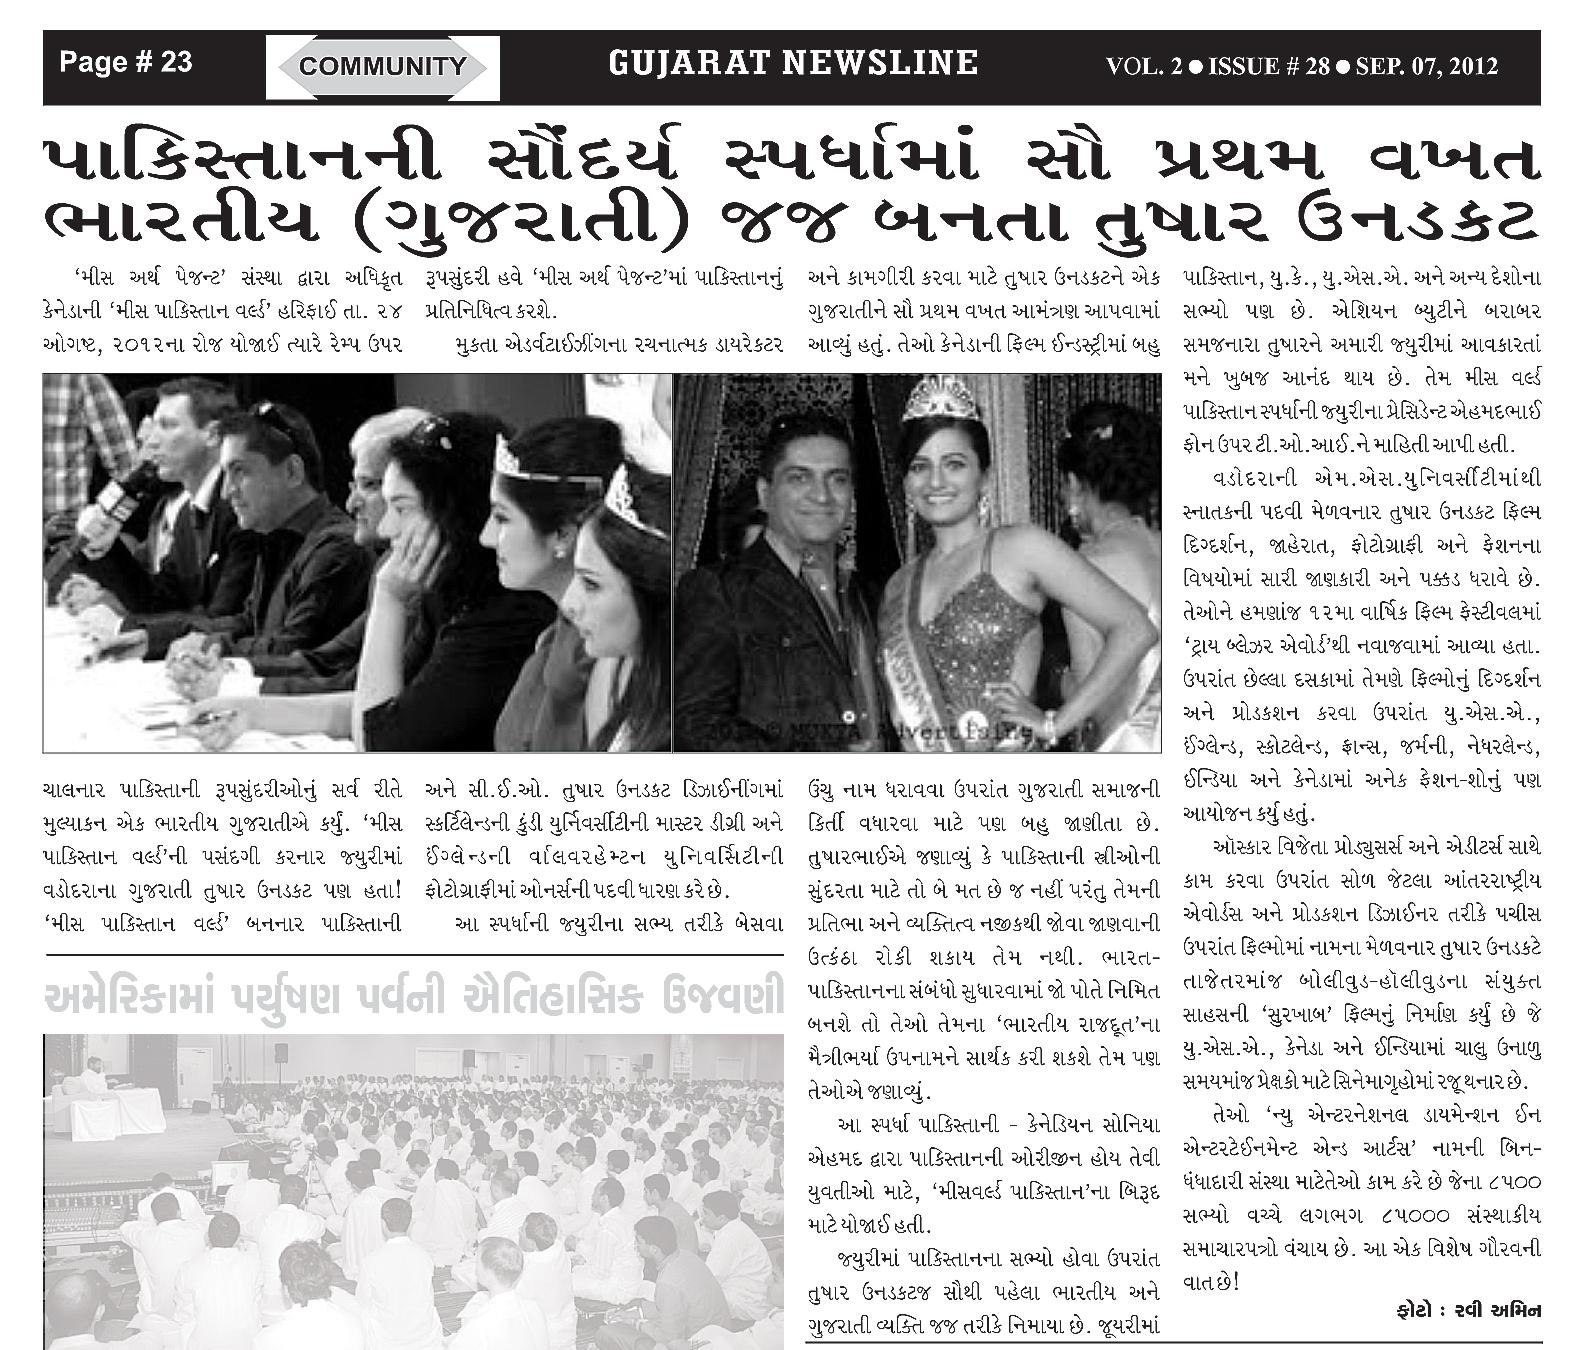 2012_news_guj_newsline_mspakworld